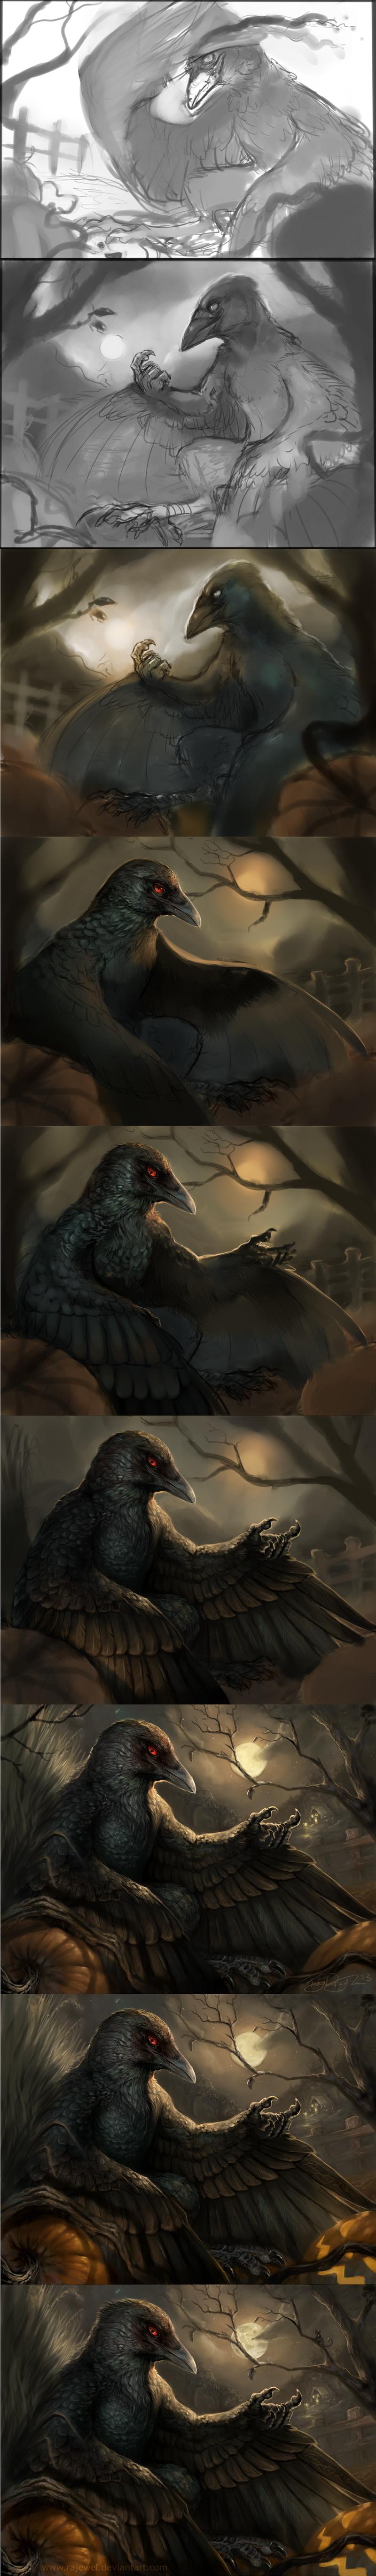 Halloween Progress by rajewel